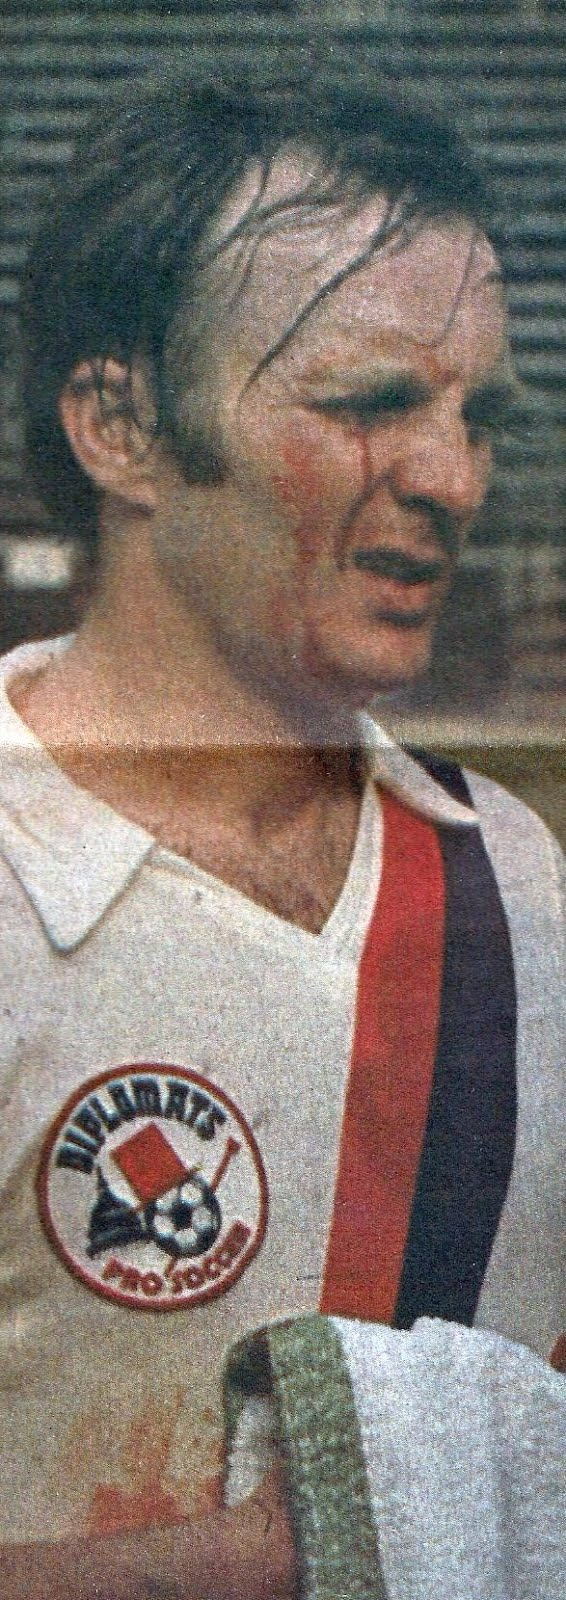 Alan Spavin 1974